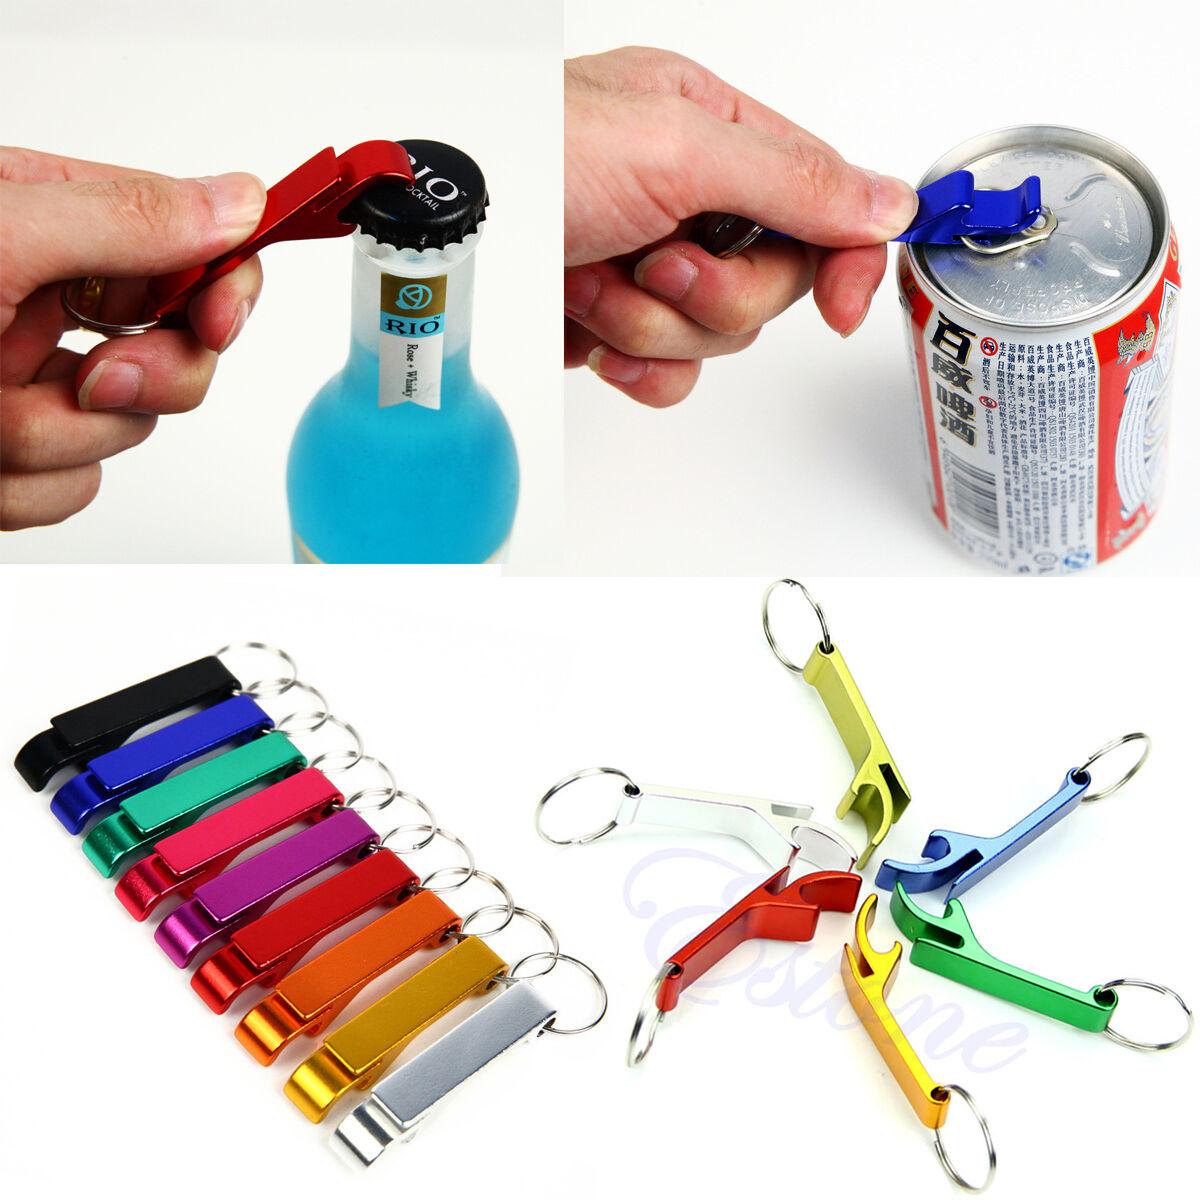 1x Metal Openers Key Chain Keychain Ring Beer Bottle Can Opener BeverageER